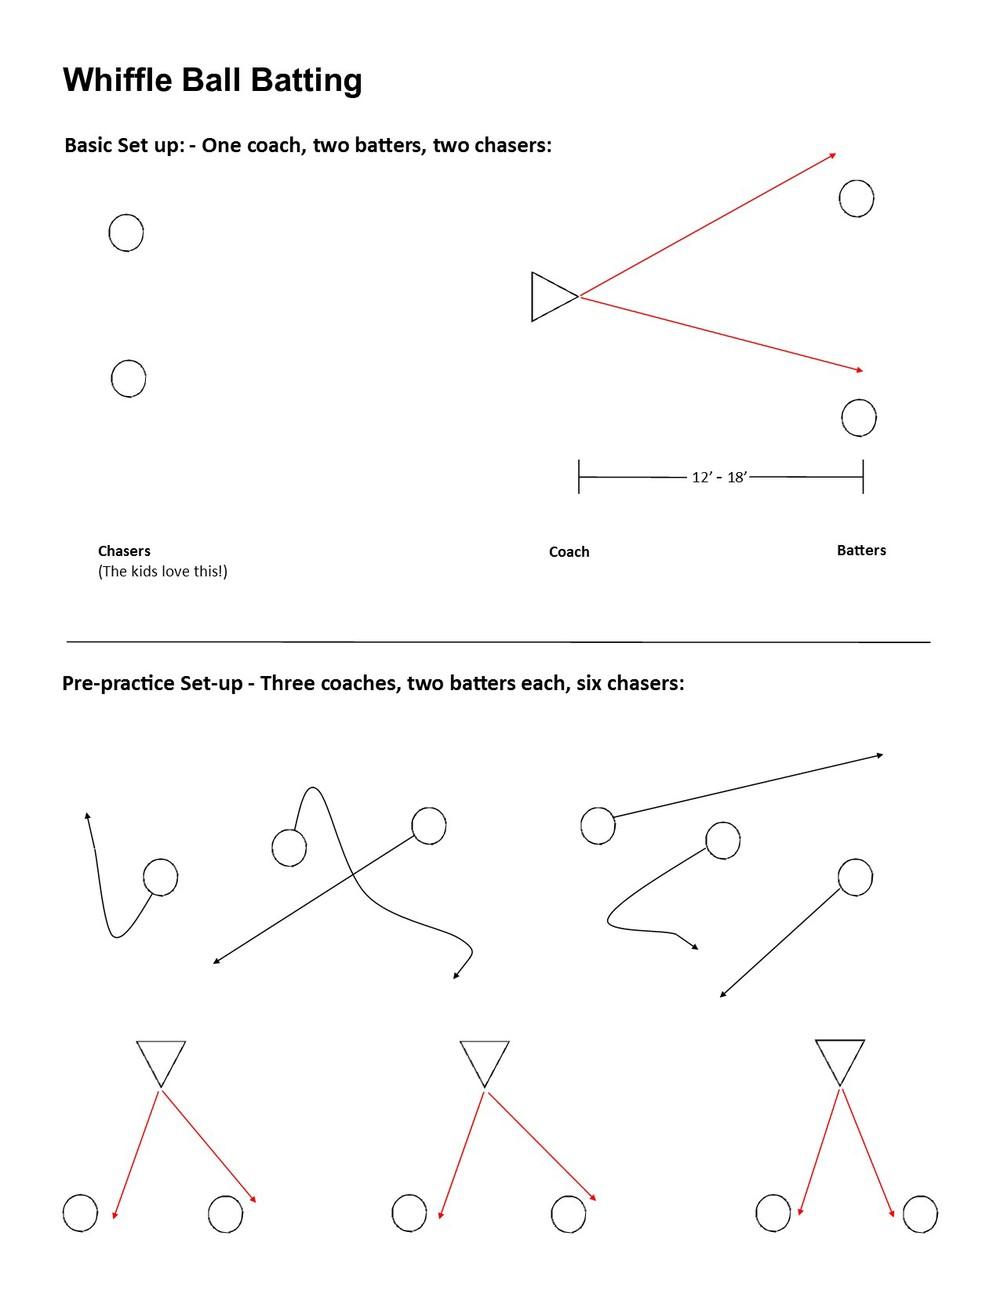 wiffle ball strike zone how to make